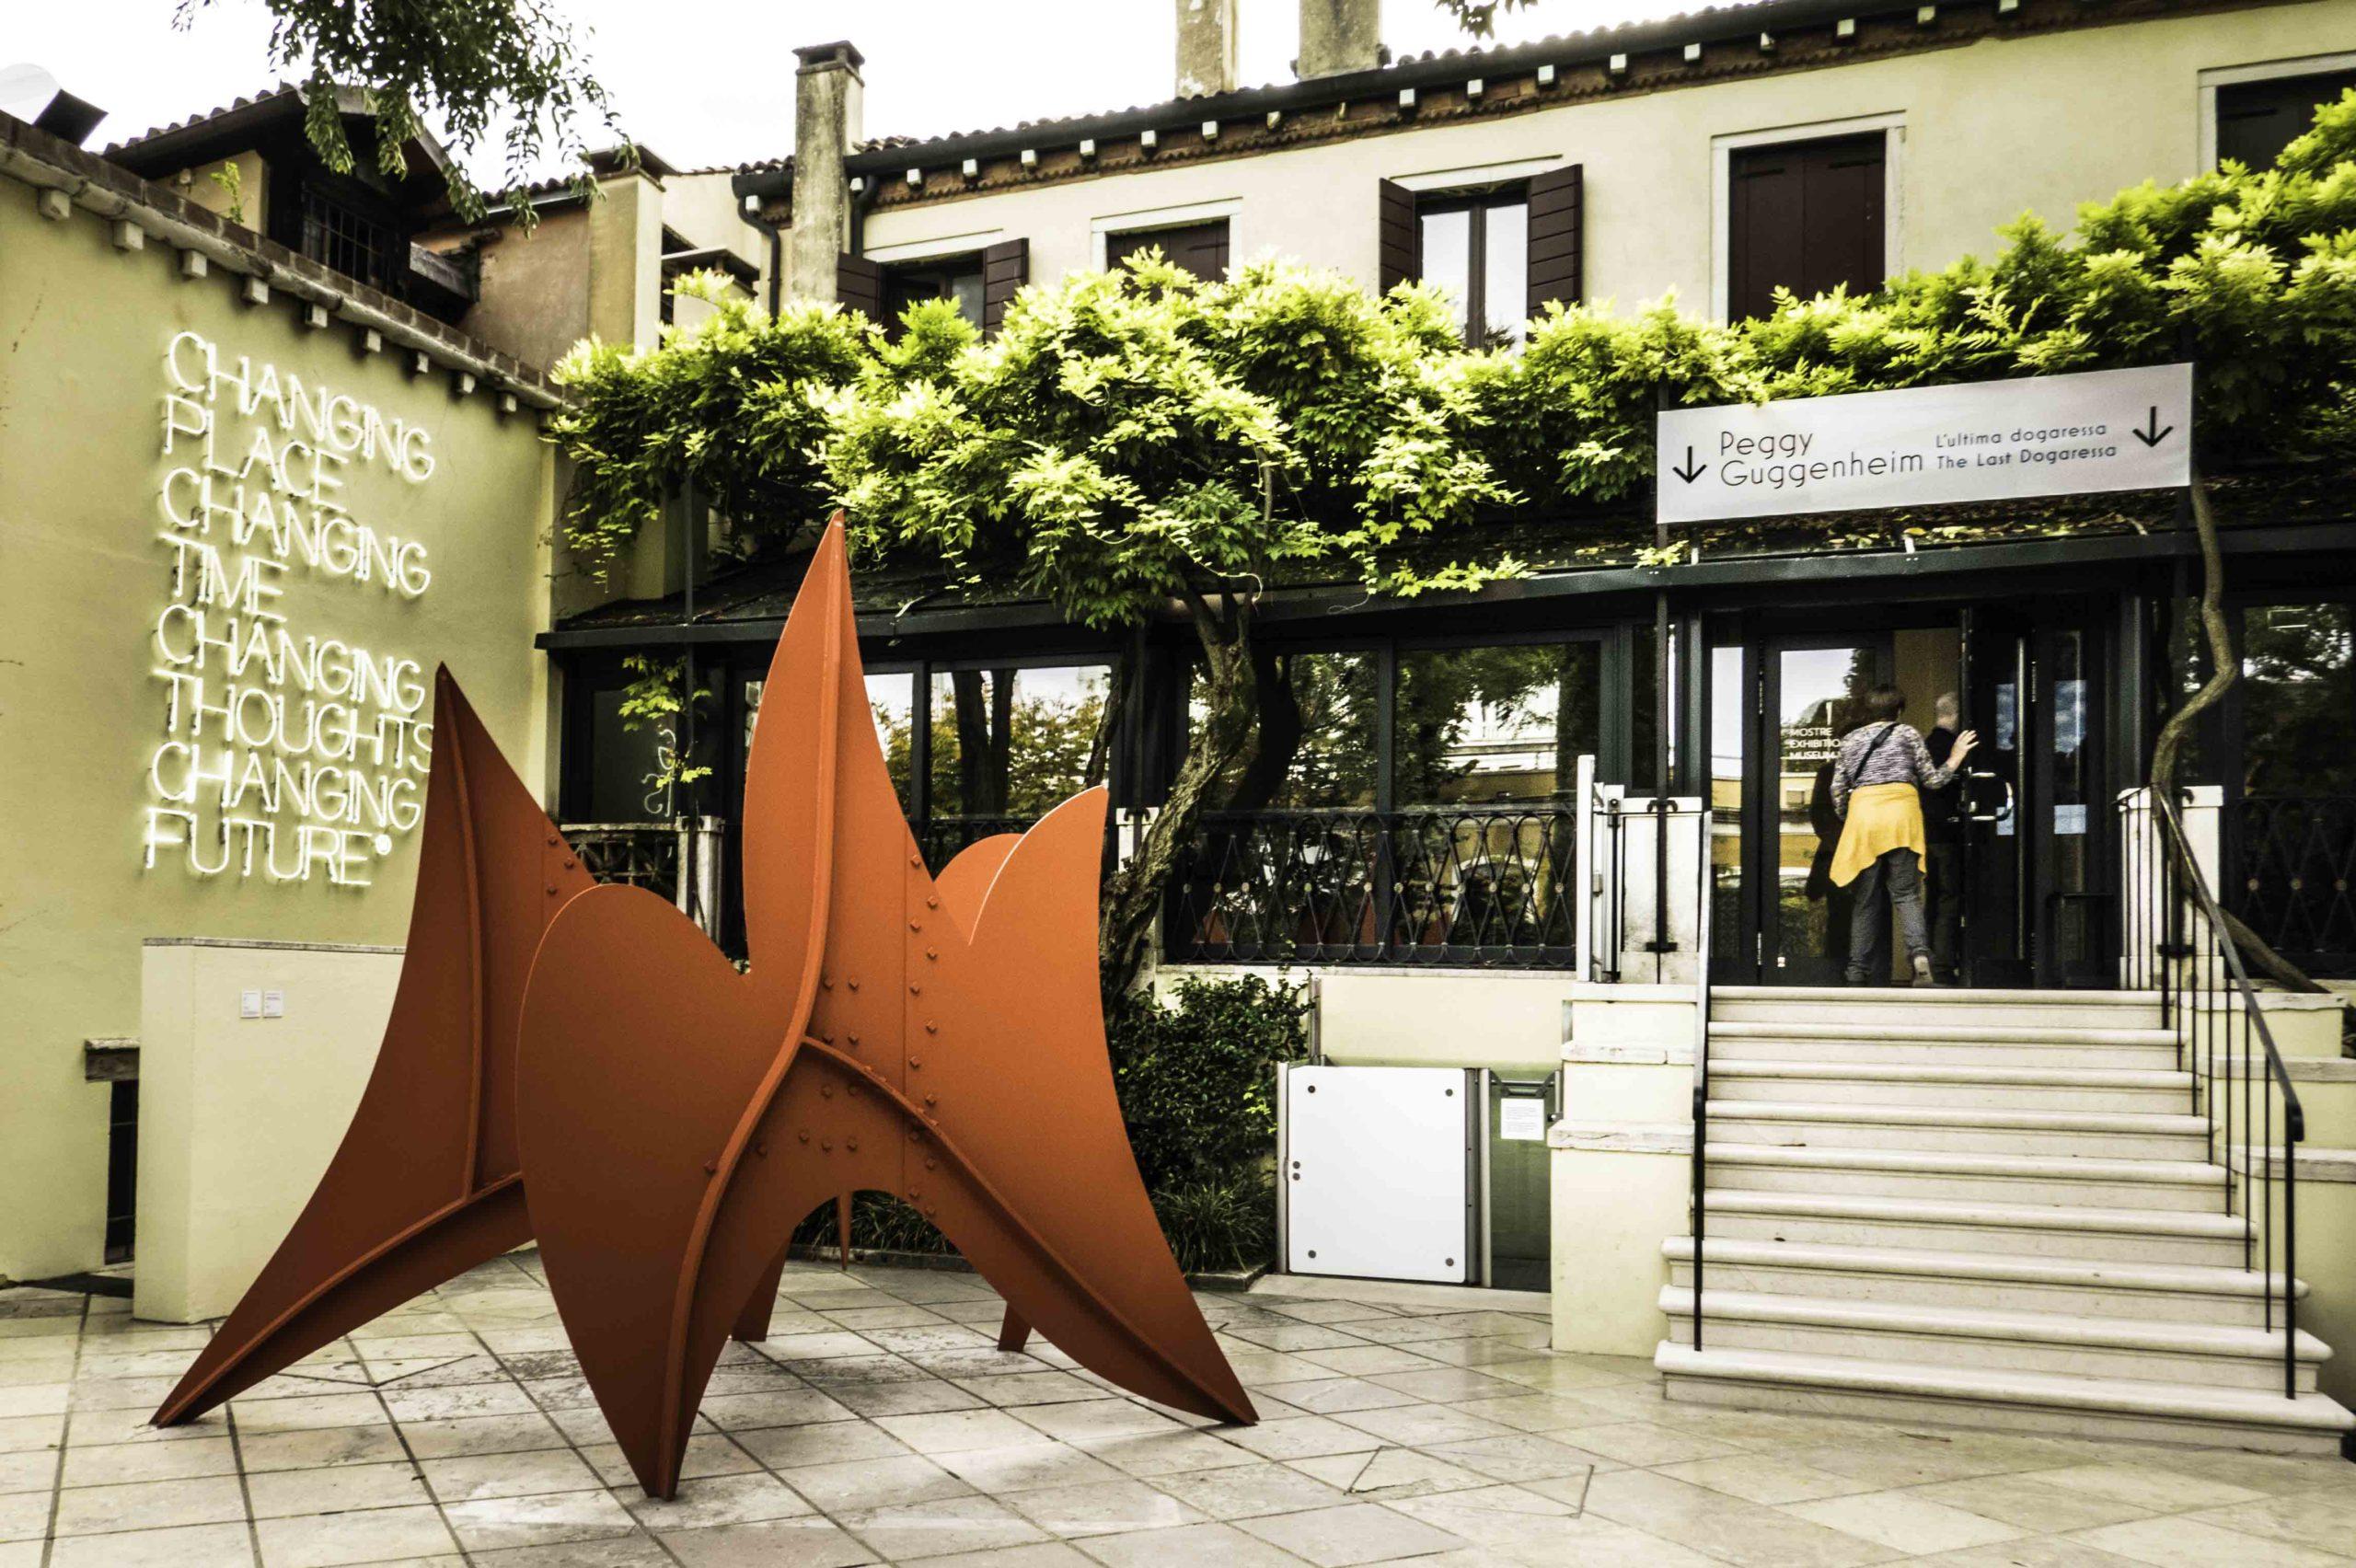 Peggy Guggenheim museum, Venice, Italy